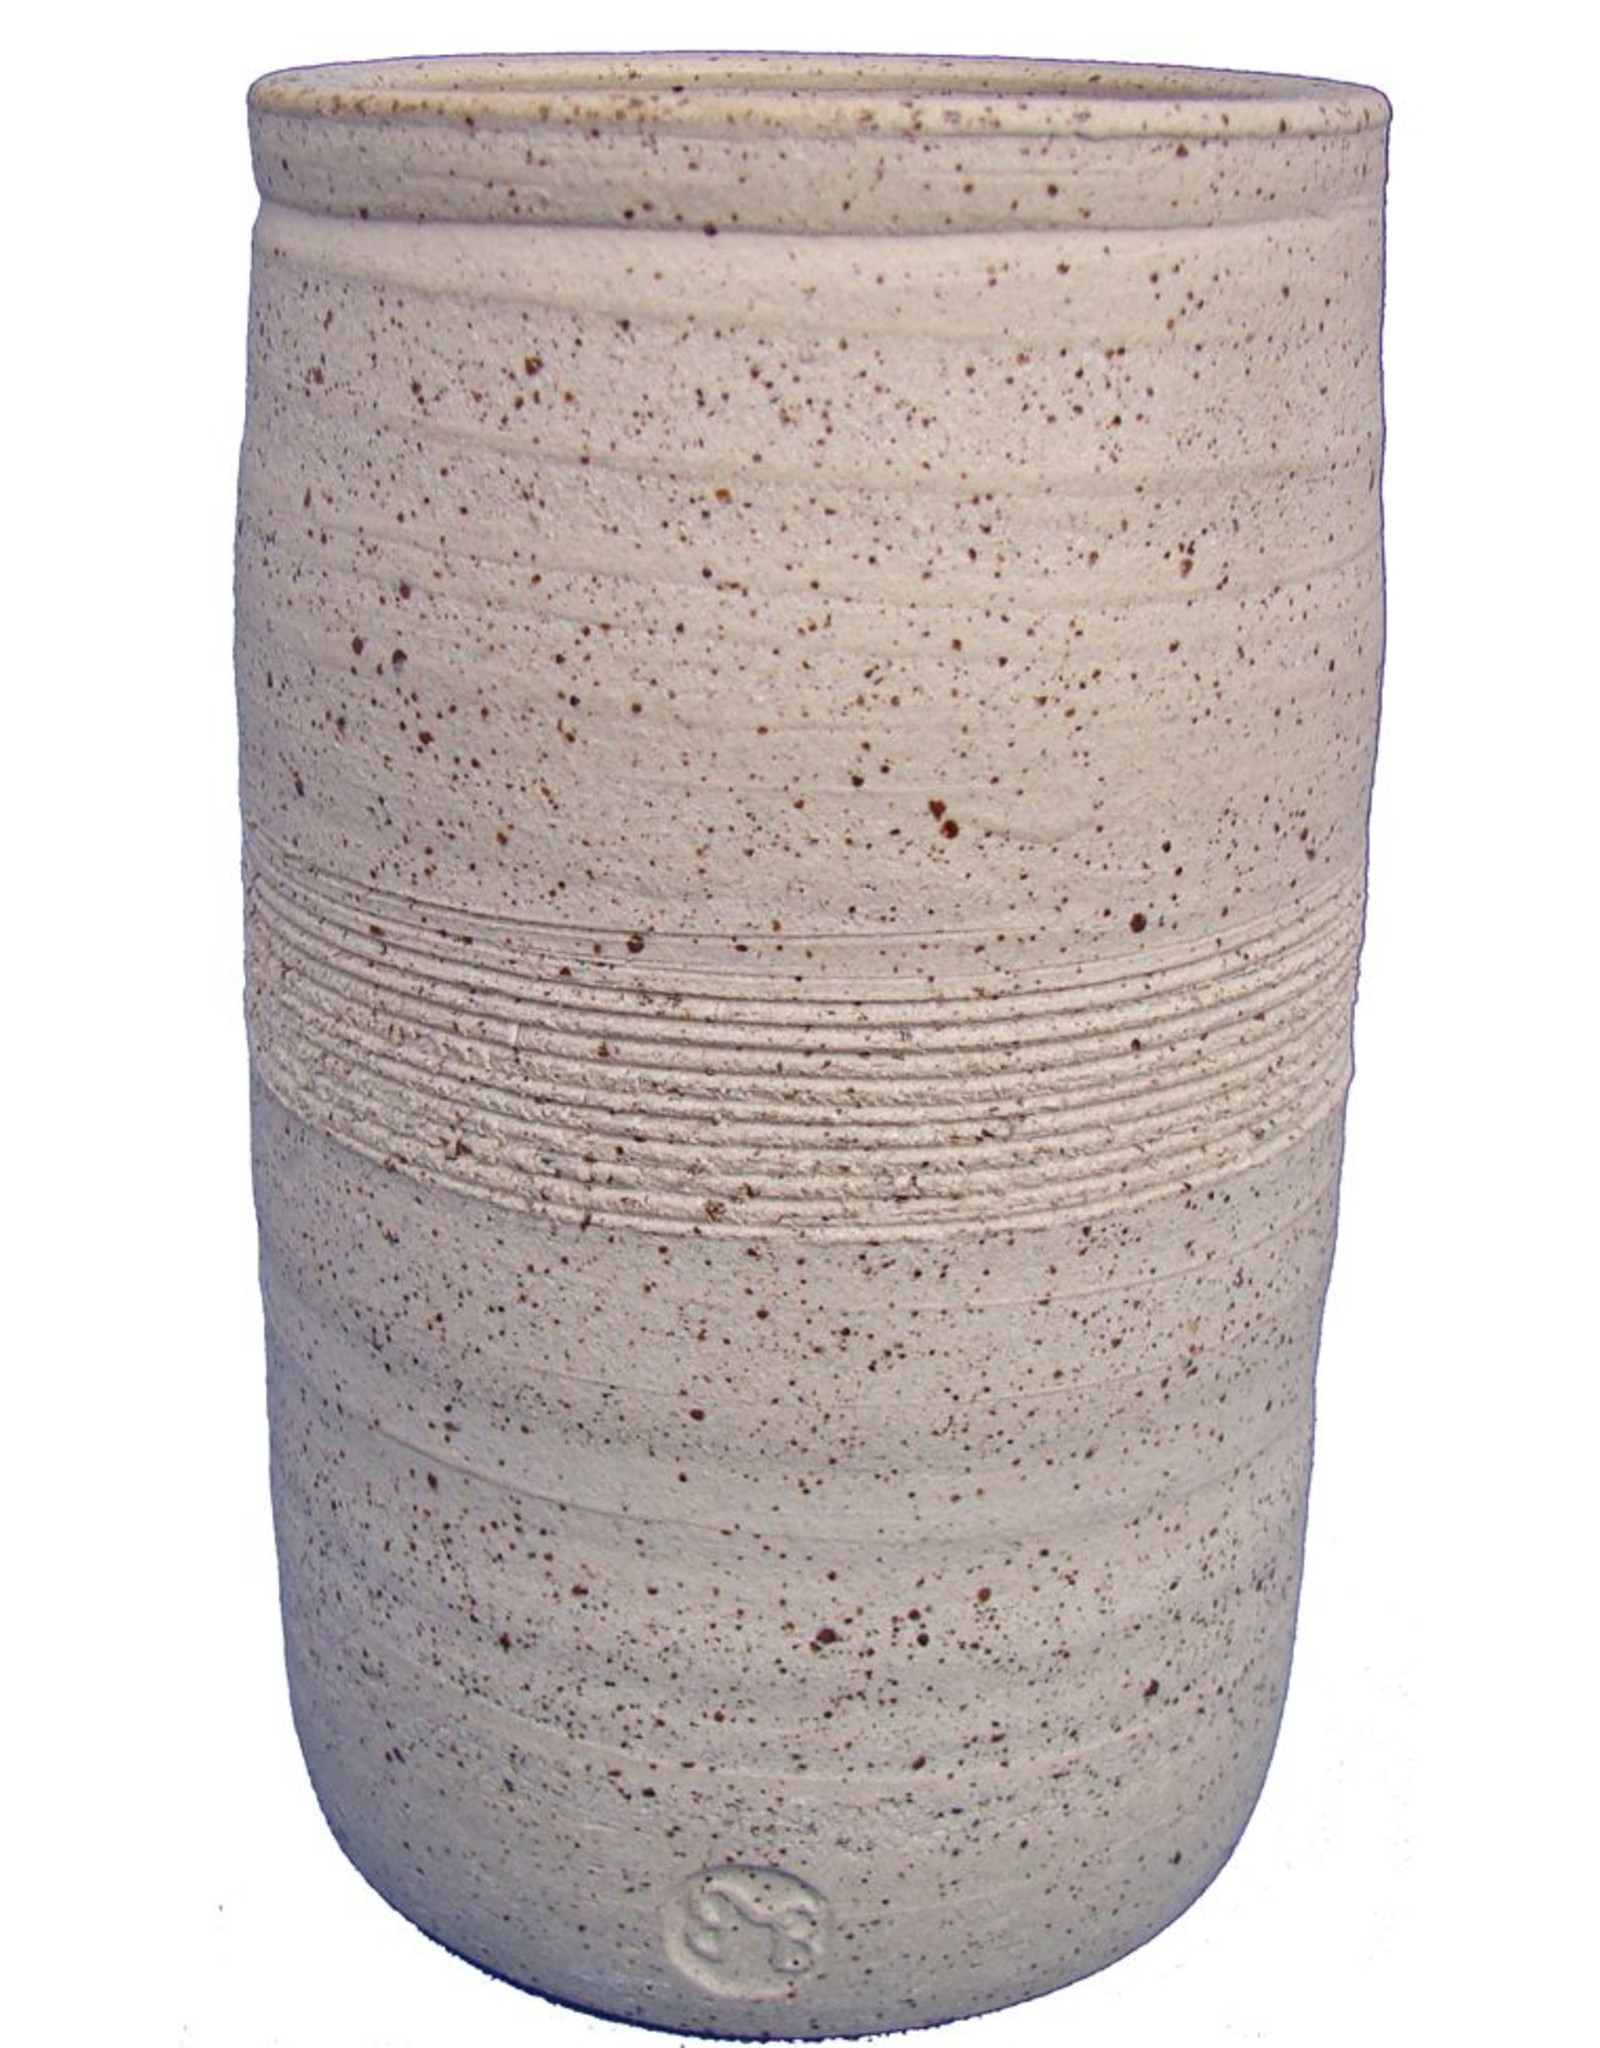 Potclays 1109 Flecked Stoneware (Firing Range 1160˚C-1290˚C) - 12.5kg